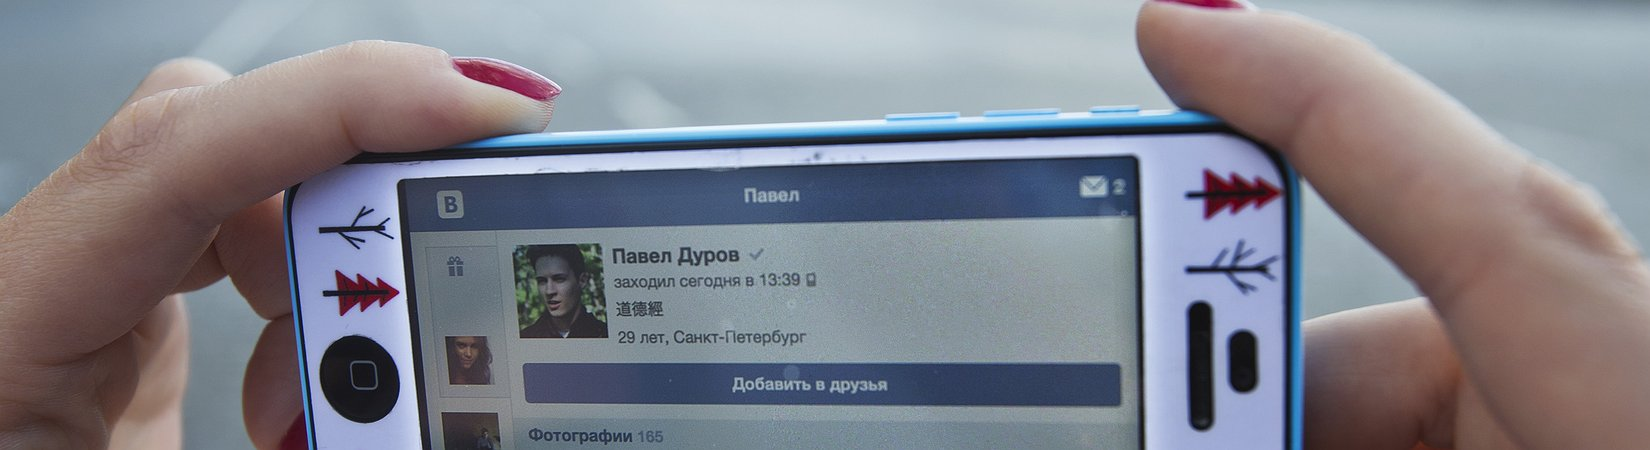 Блокировка ВКонтакте и Яндекса на Украине в цифрах и фактах